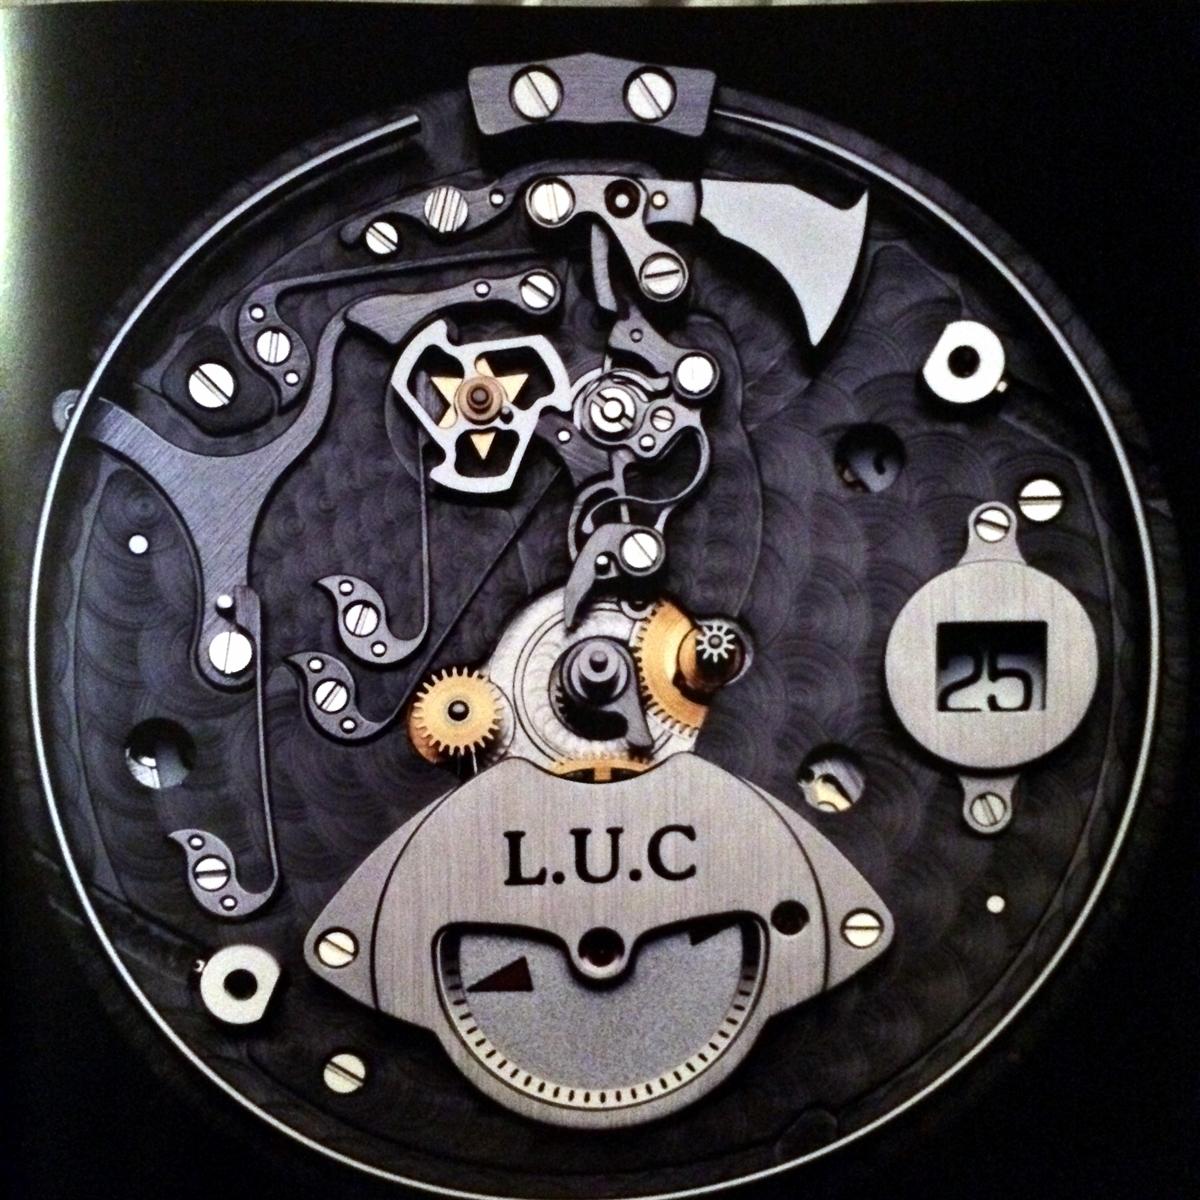 16 design z zegarkiem w ręku luksusowe zegarki SIHH Geneve lifestyle forelements blog